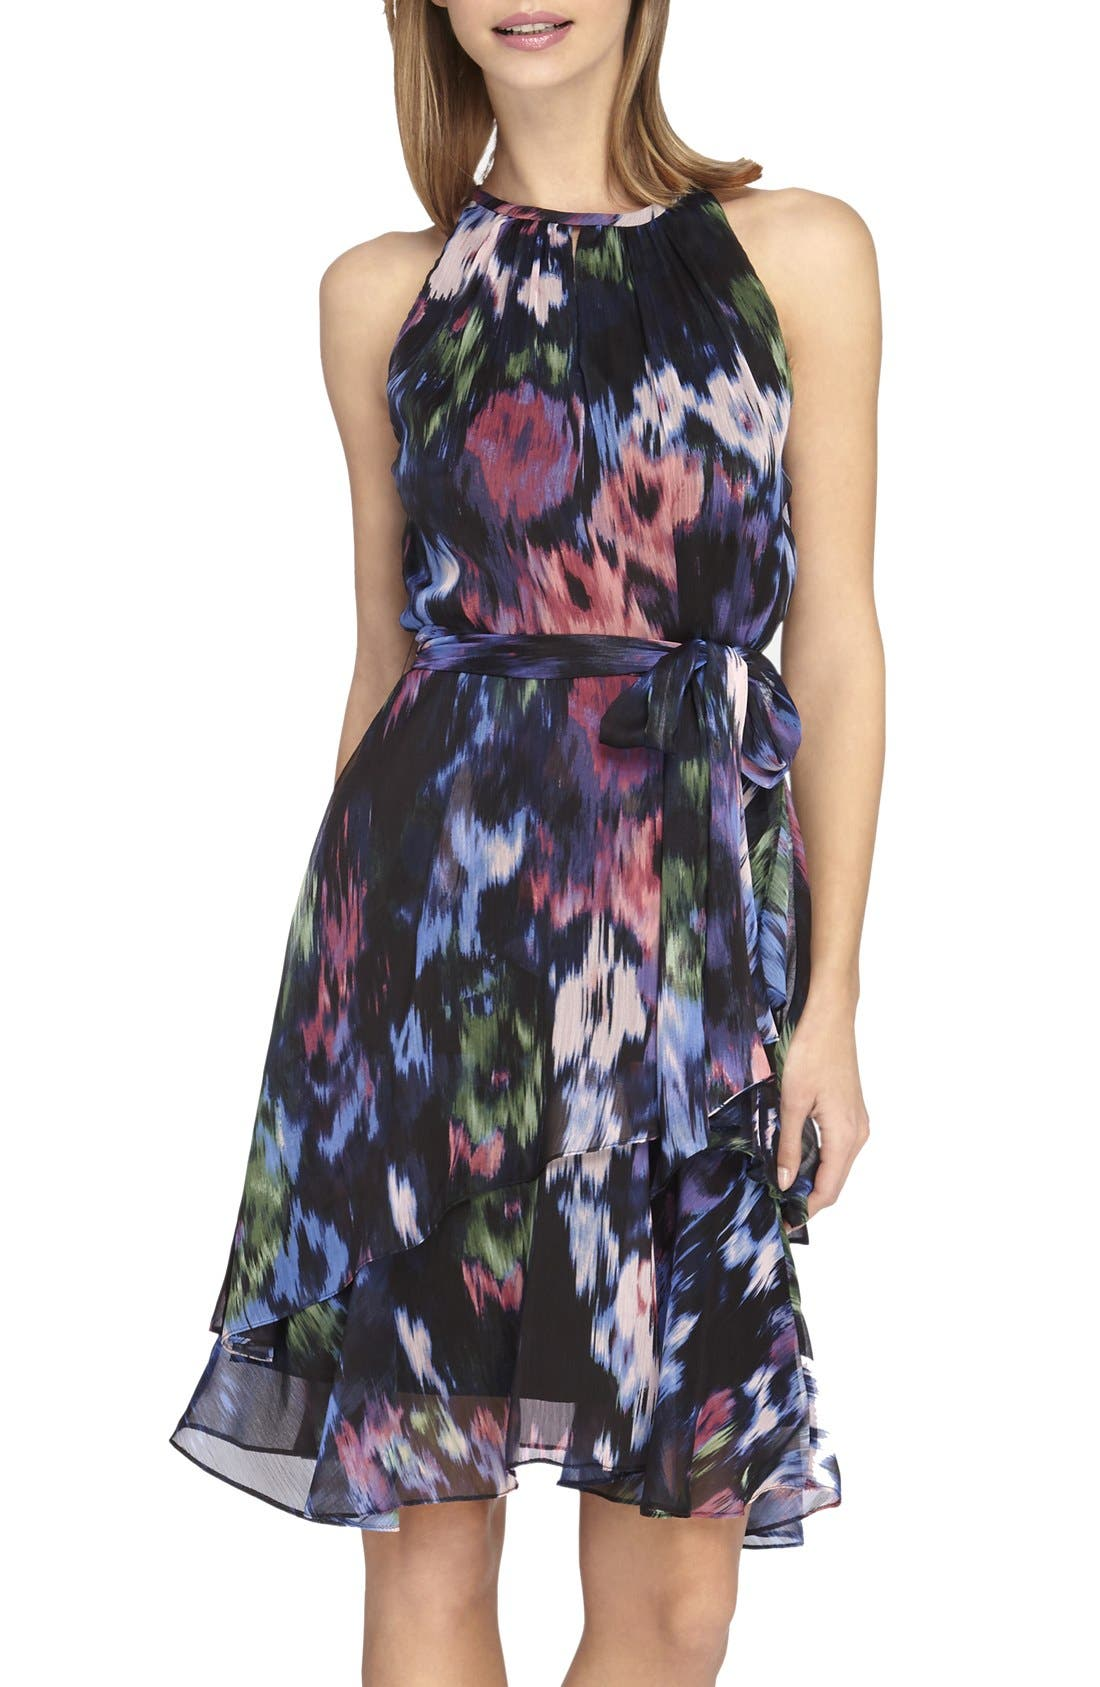 Alternate Image 1 Selected - Tahari Print Chiffon Fit & Flare Dress (Regular & Petite)